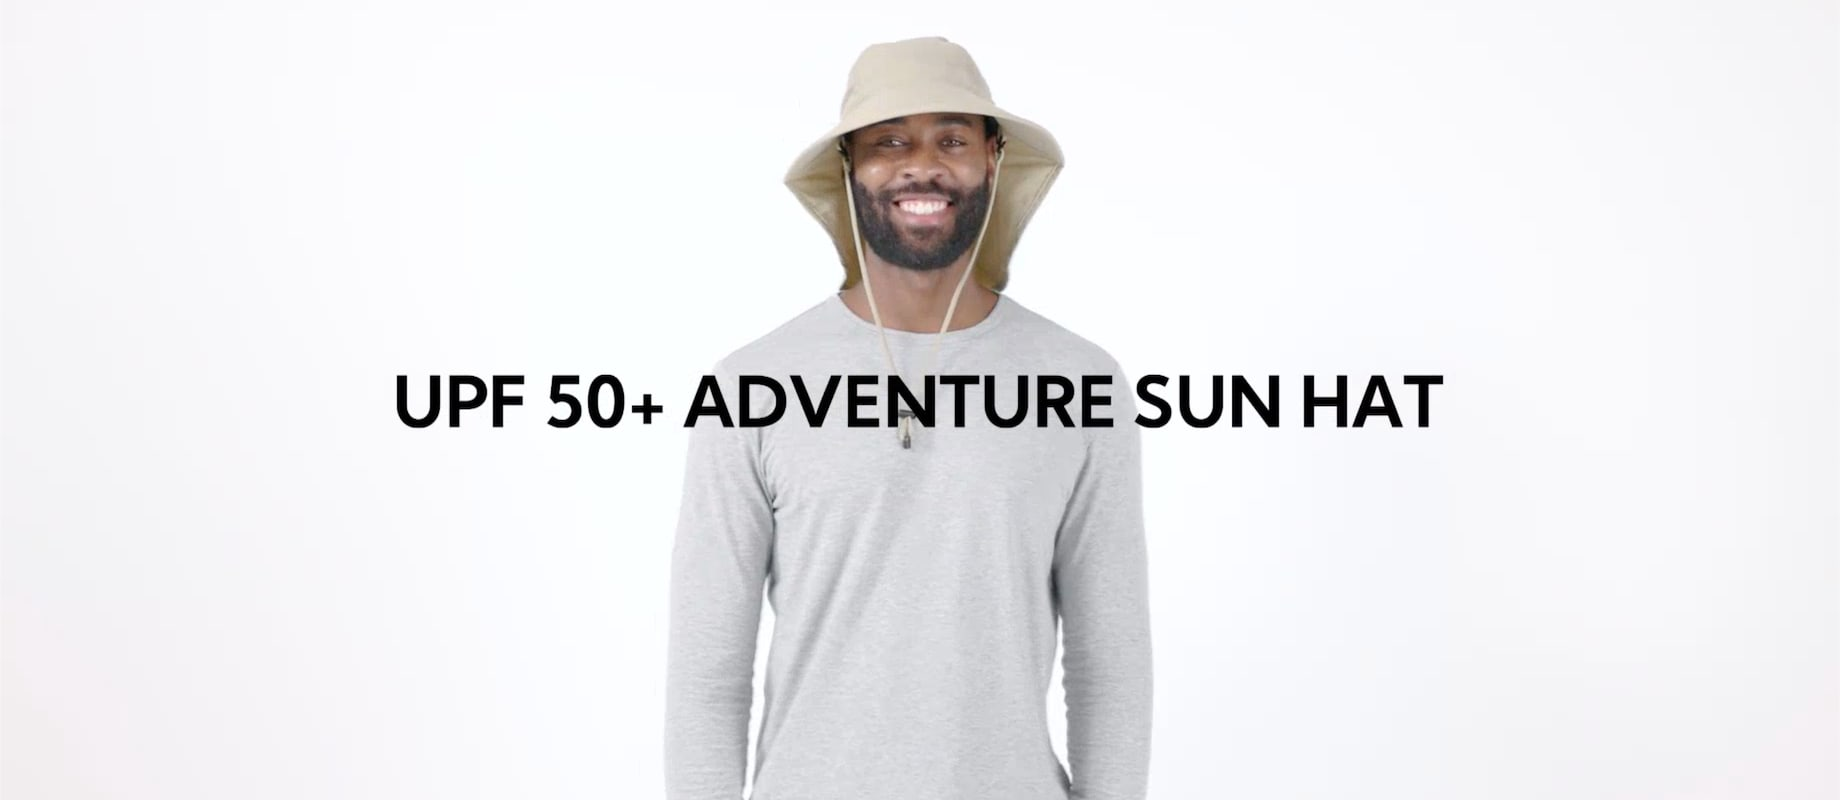 Men's Adventure Sun Hat UPF 50+ | Men's Legionnaire Style Hat